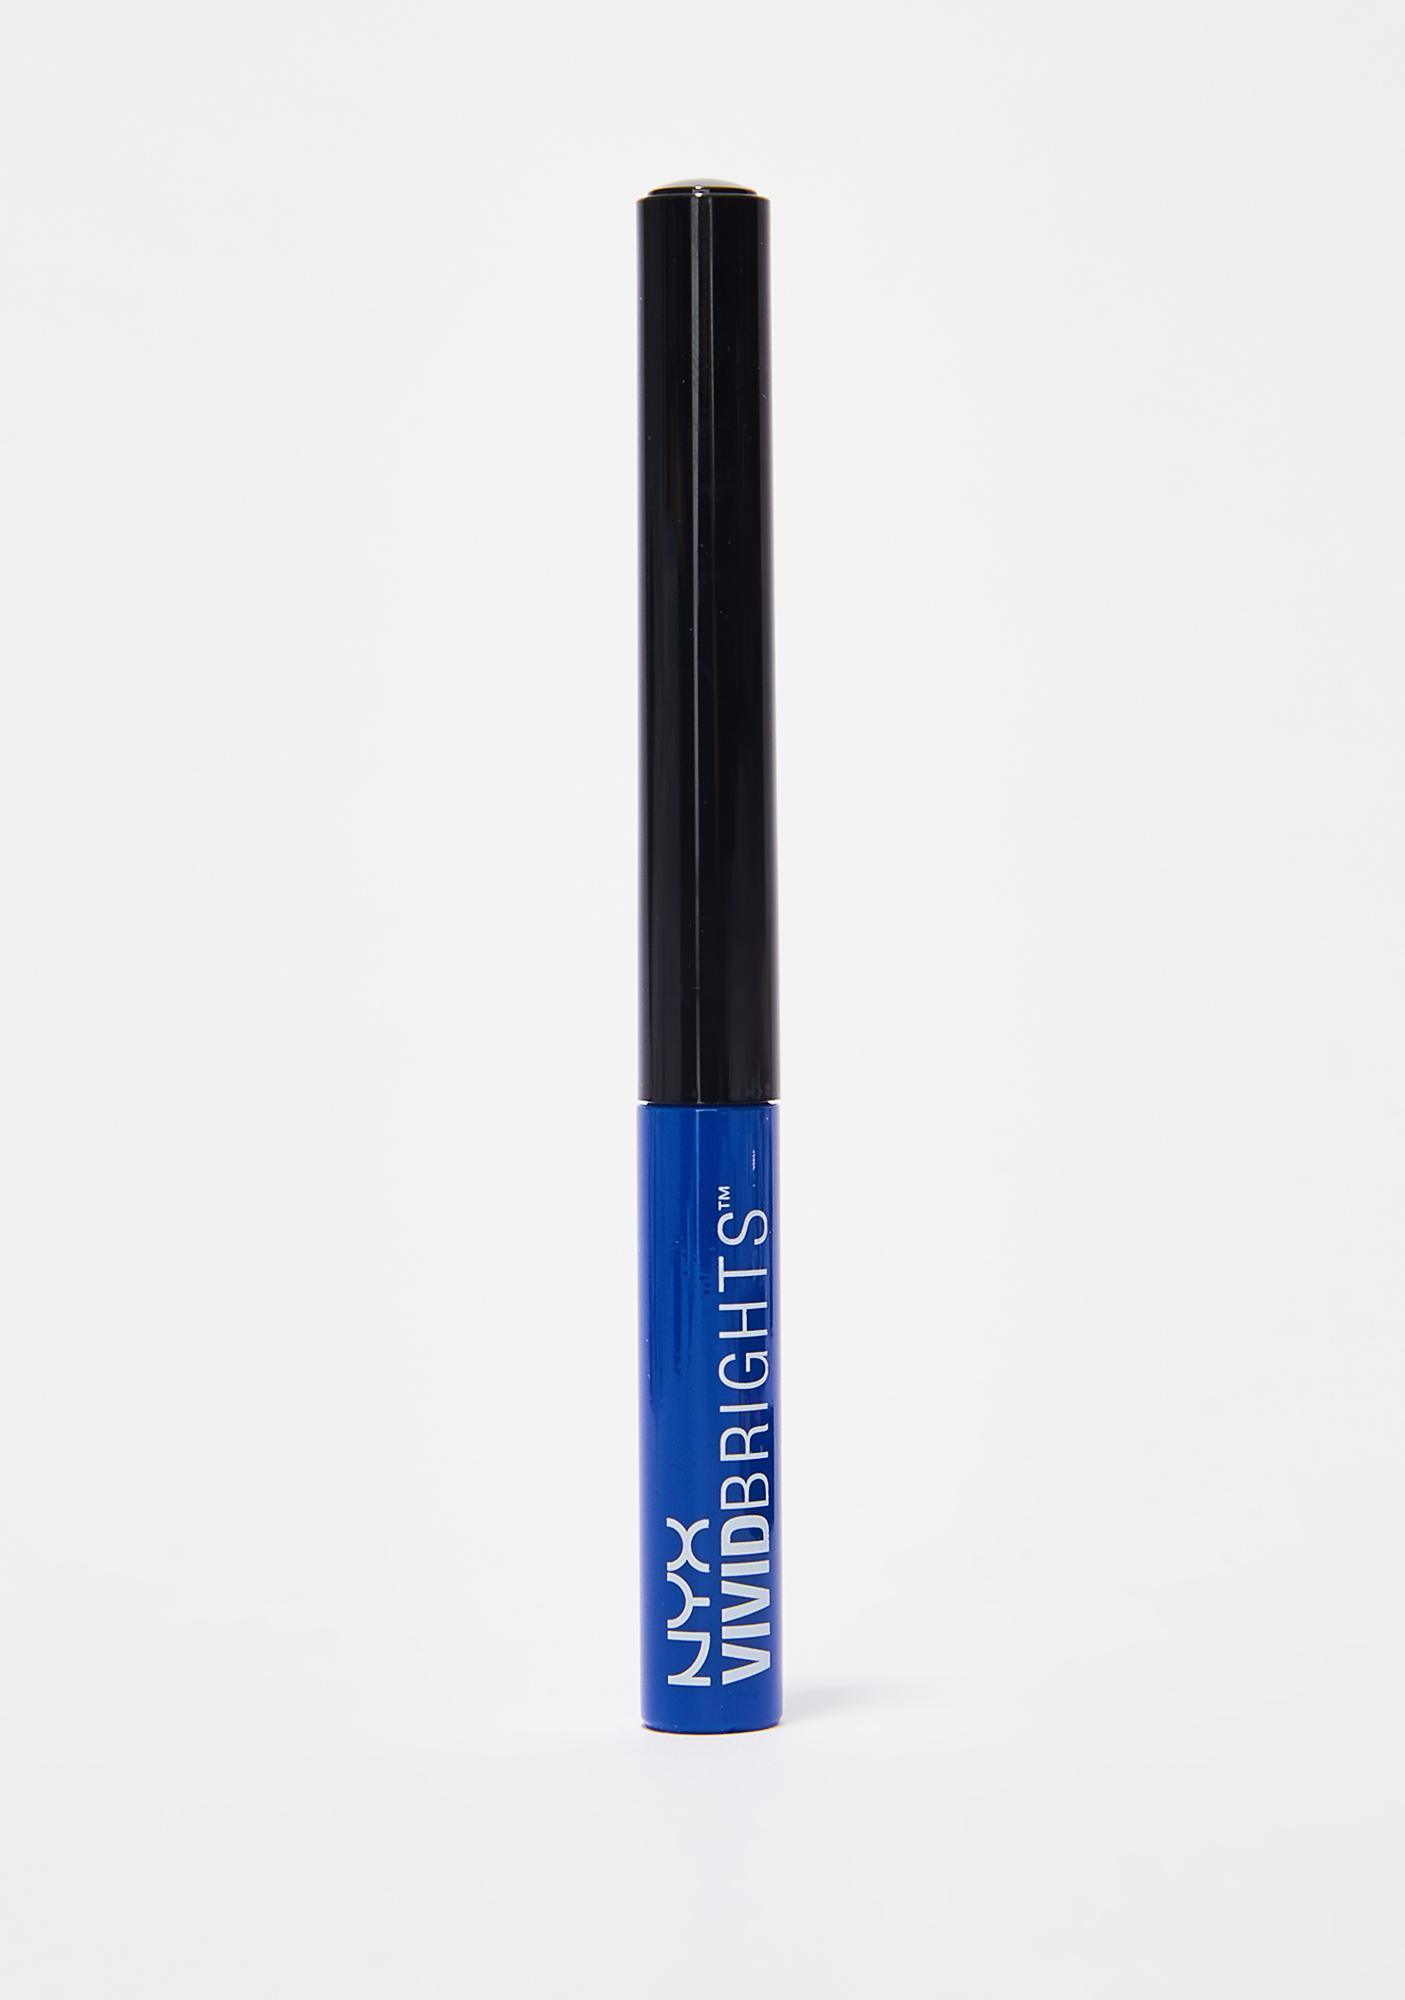 NYX Vivid Sapphire Vivid Brights Eyeliner